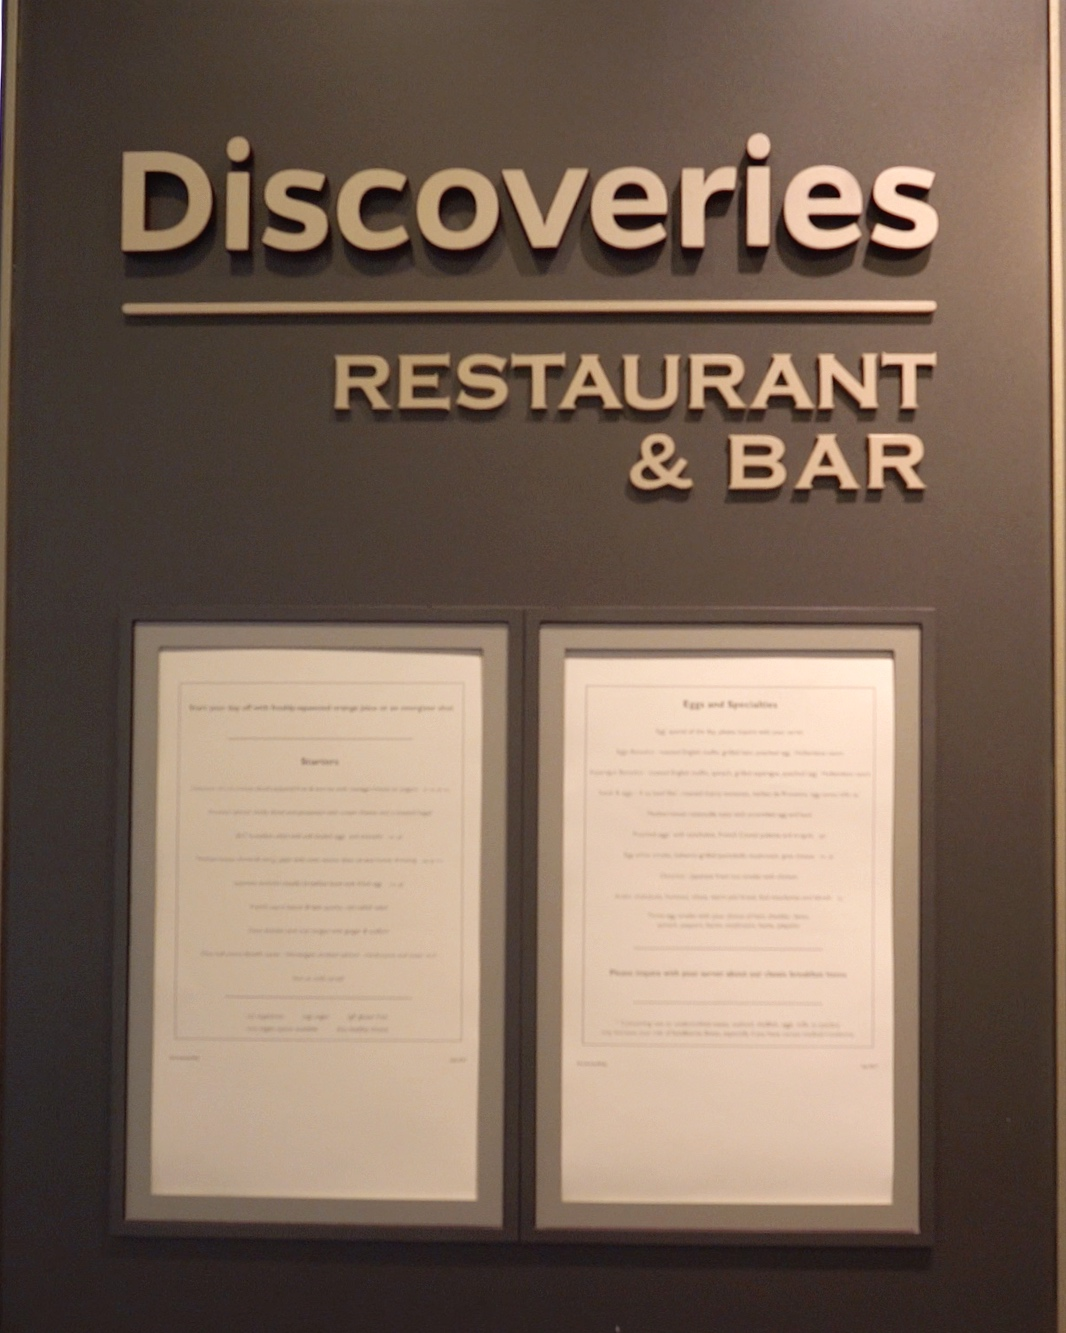 Discoveries restaurant.